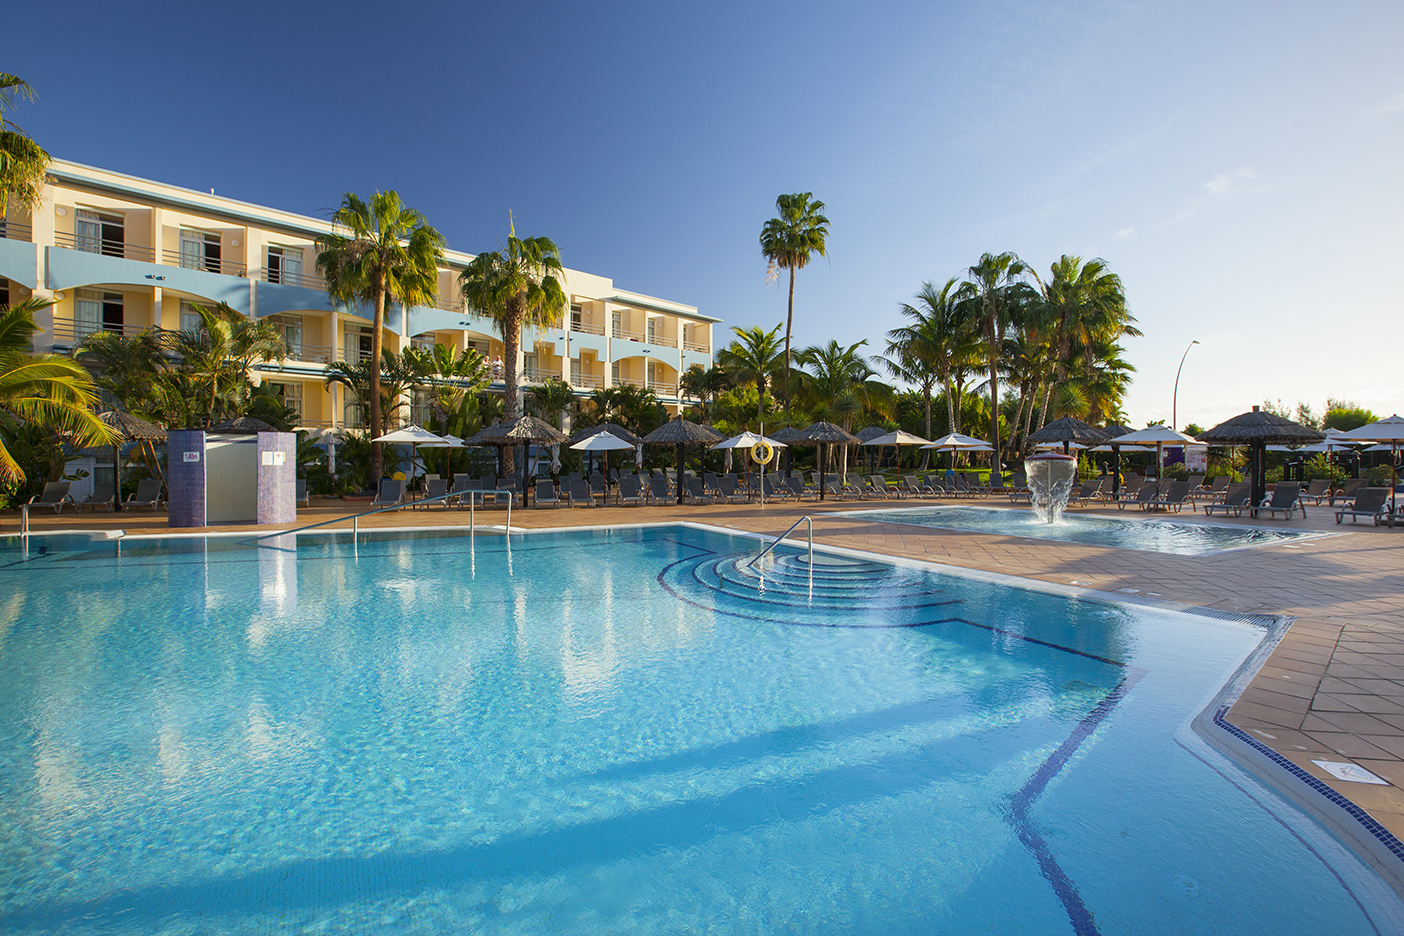 Lopesan Hotel Group/ canariasnoticias